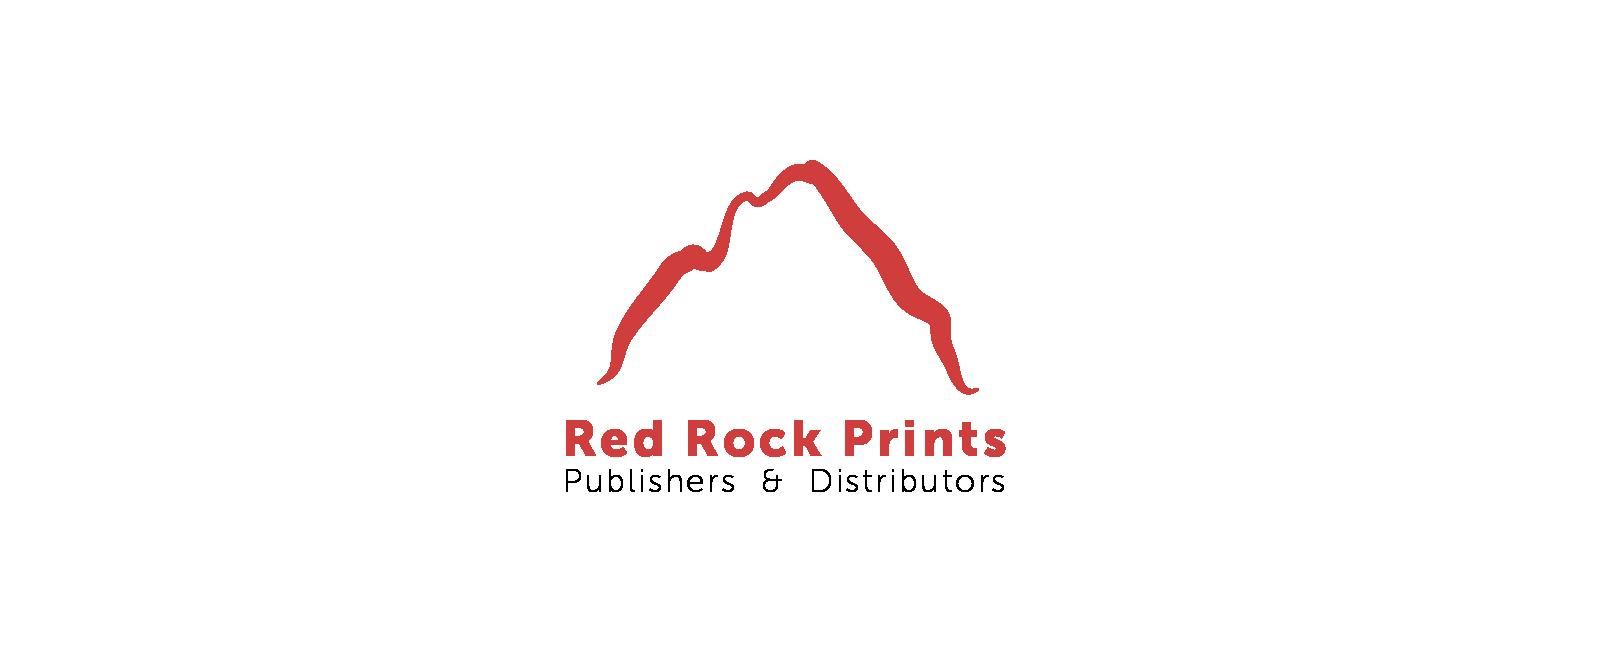 Lucy Stronach - Red Rock Prints